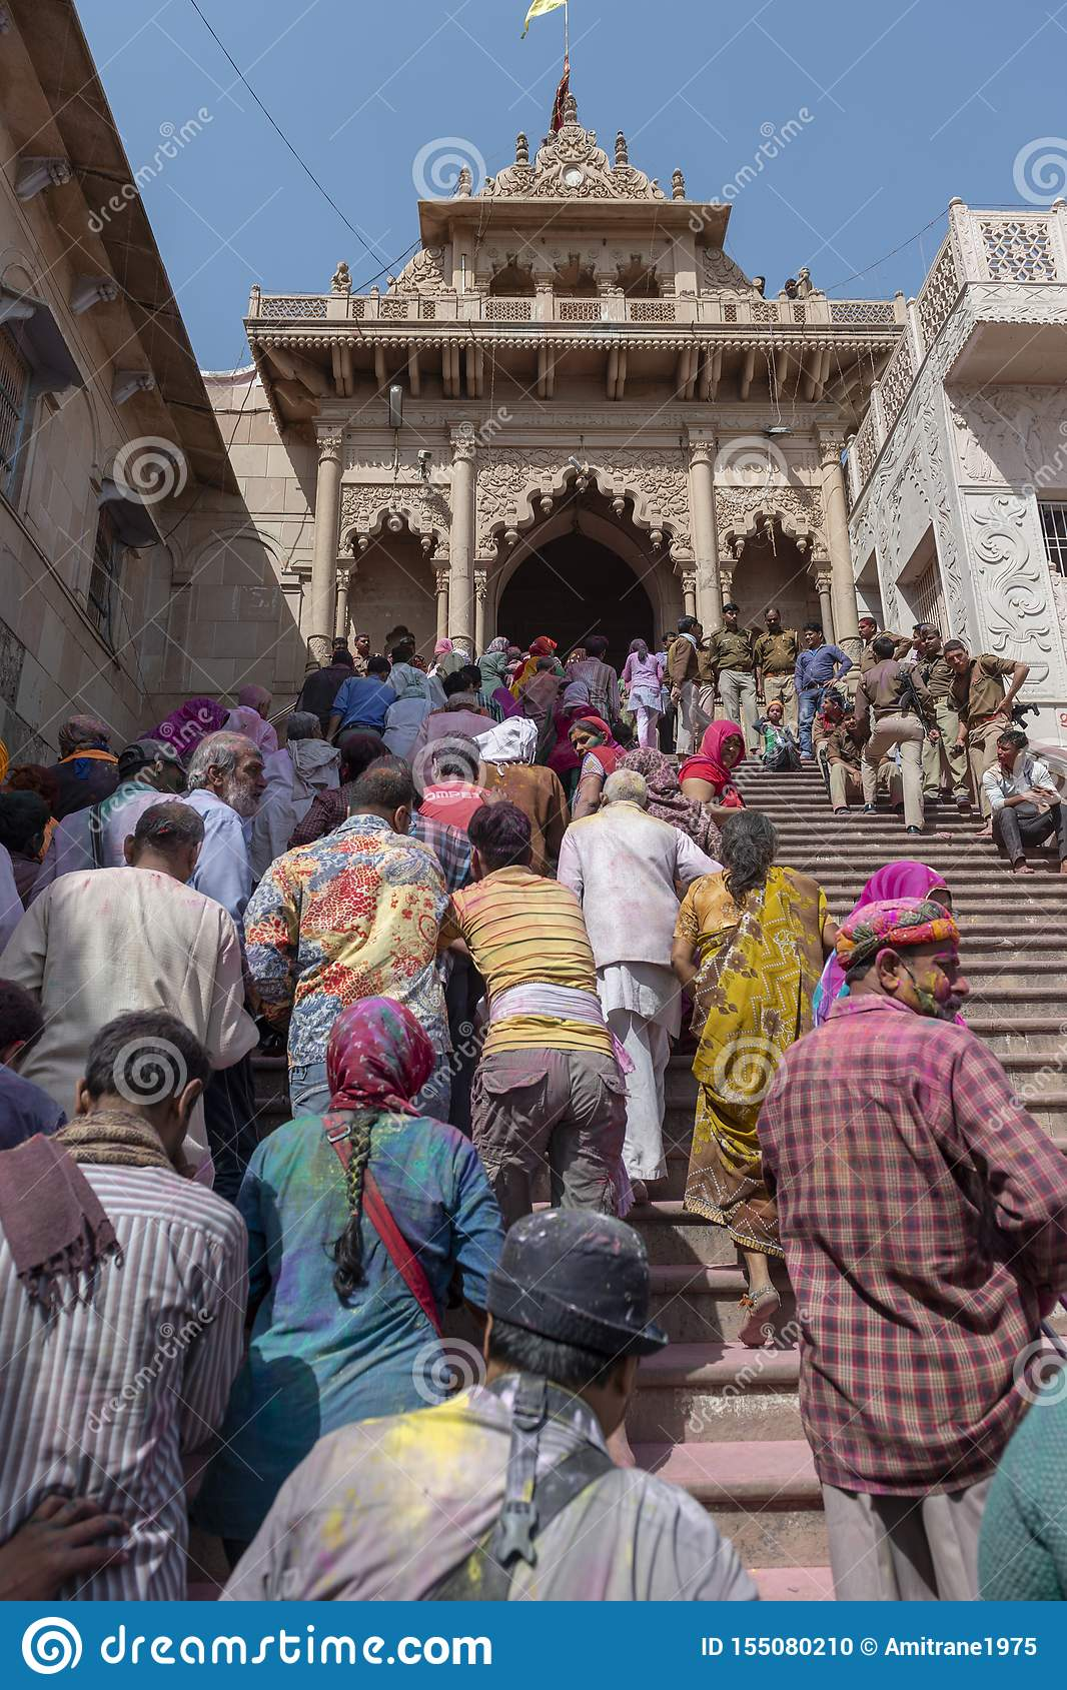 Entrada de Radha Rani Temple em Barsana durante o festival de Holi, Uttar Pradesh, Índia